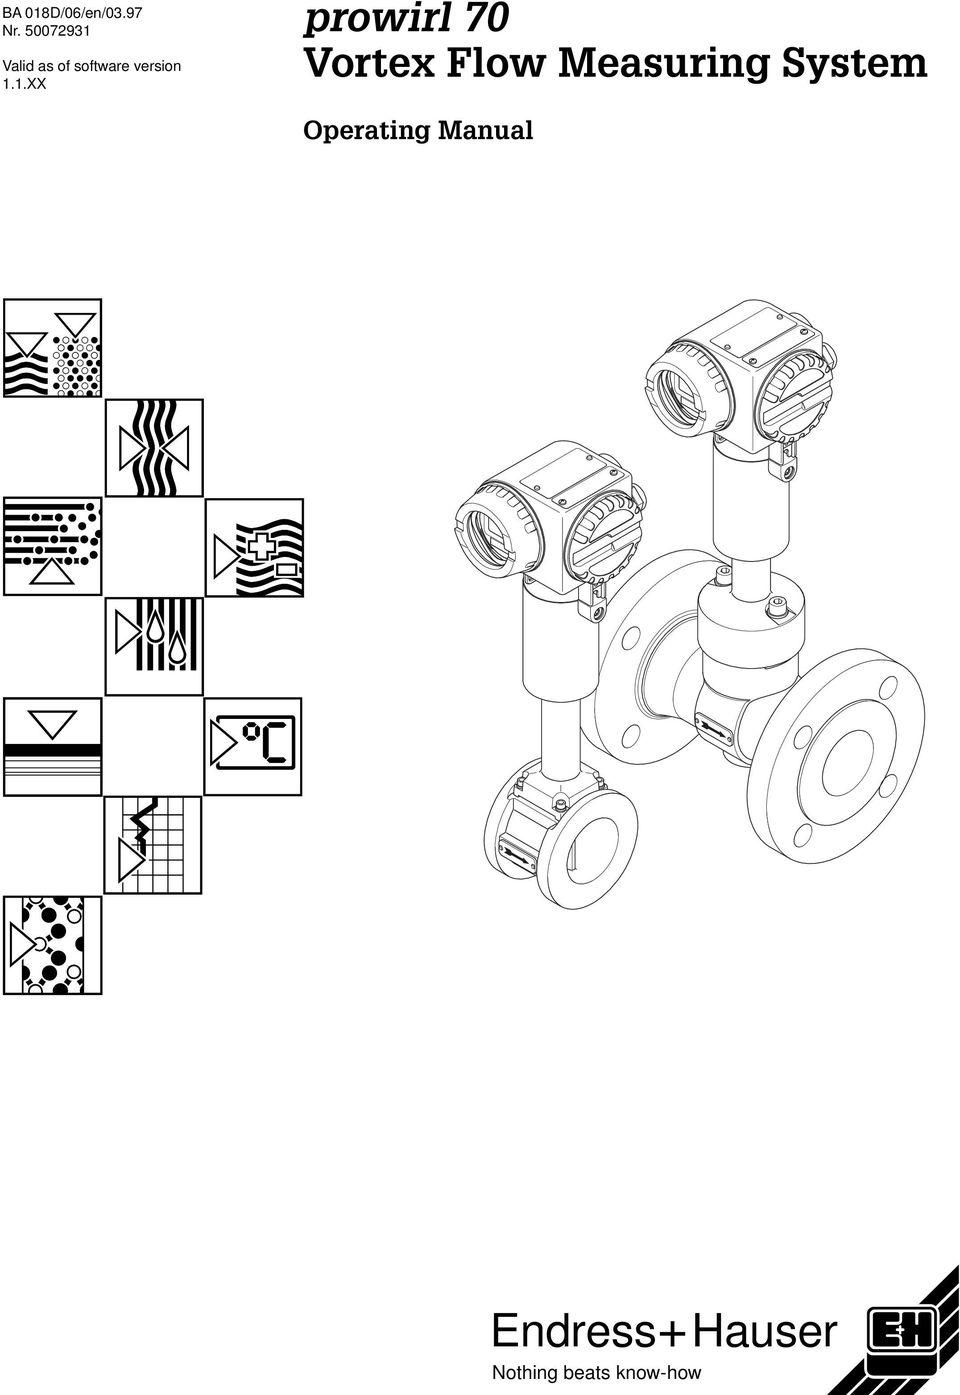 Endress Hauser. prowirl 70 Vortex Flow Measuring System